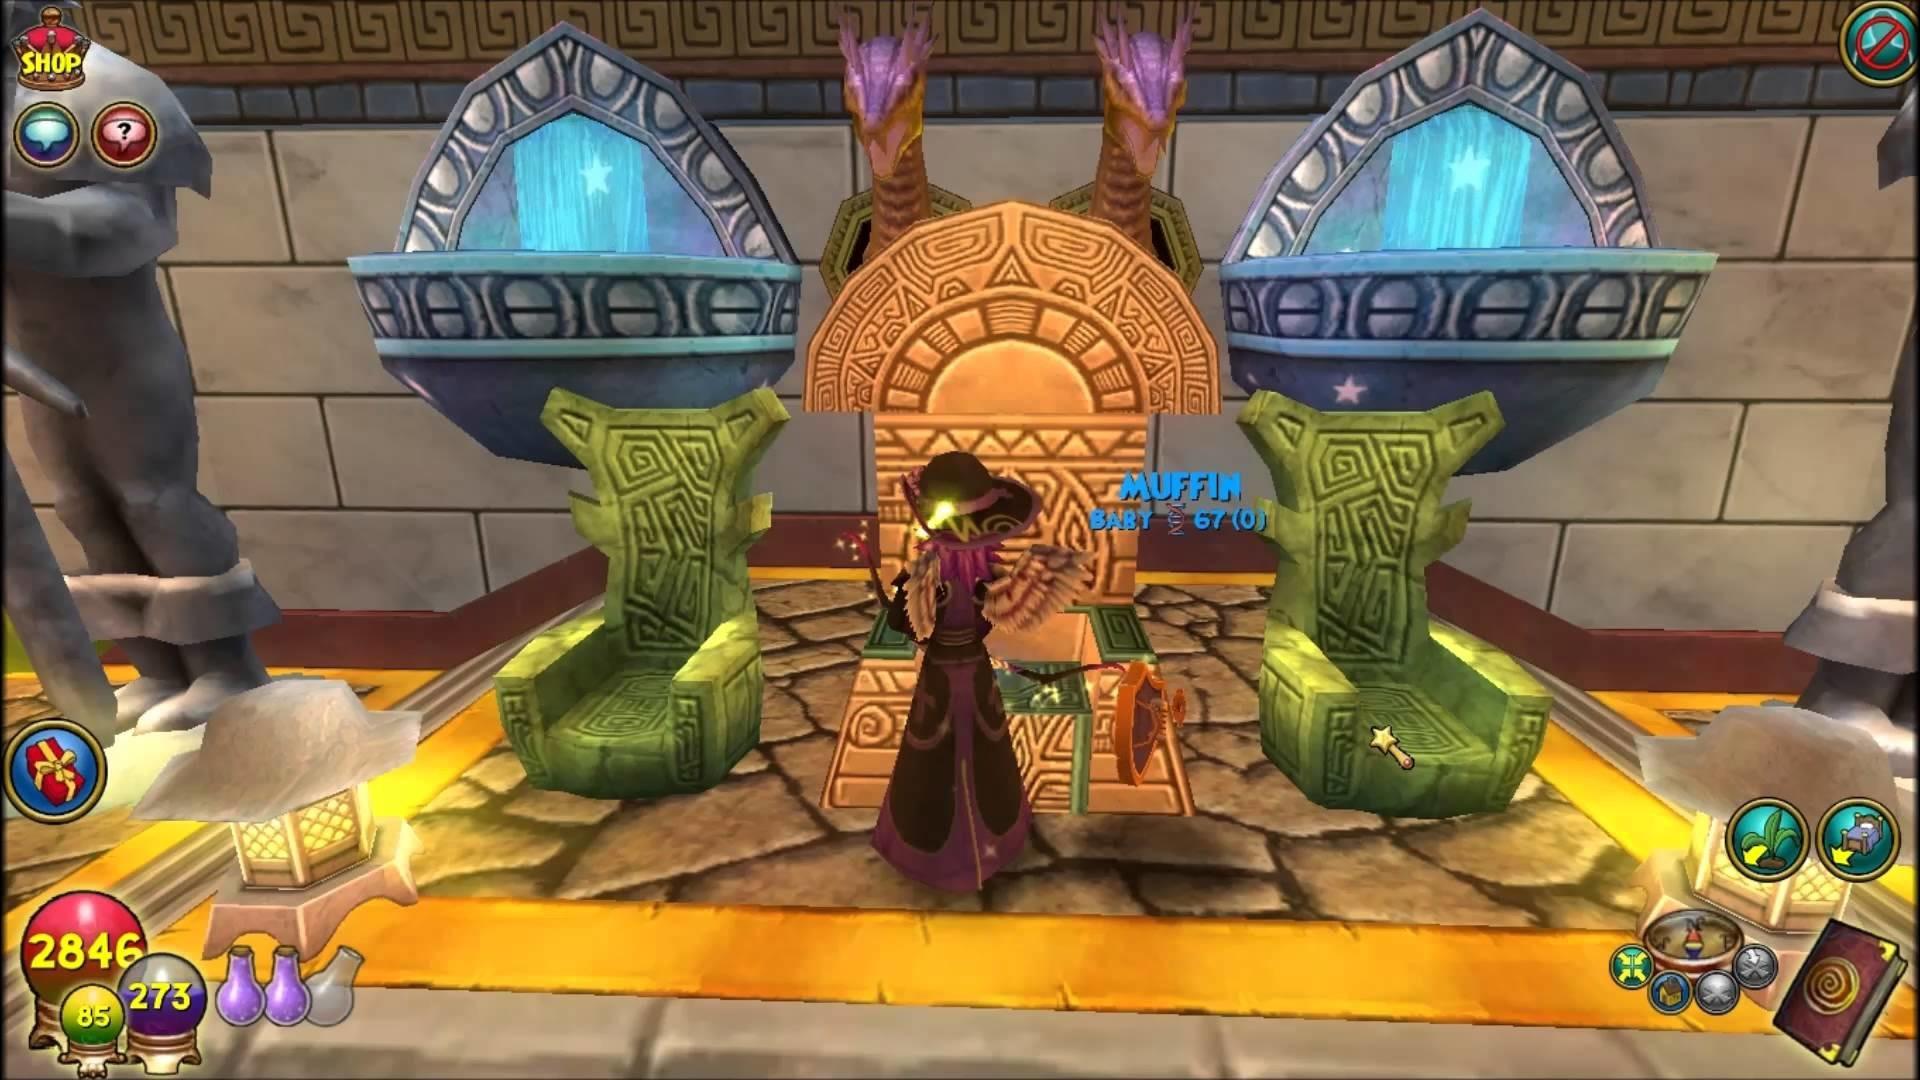 Res: 1920x1080, Wizard101 invites us to the dinosaur world of Azteca